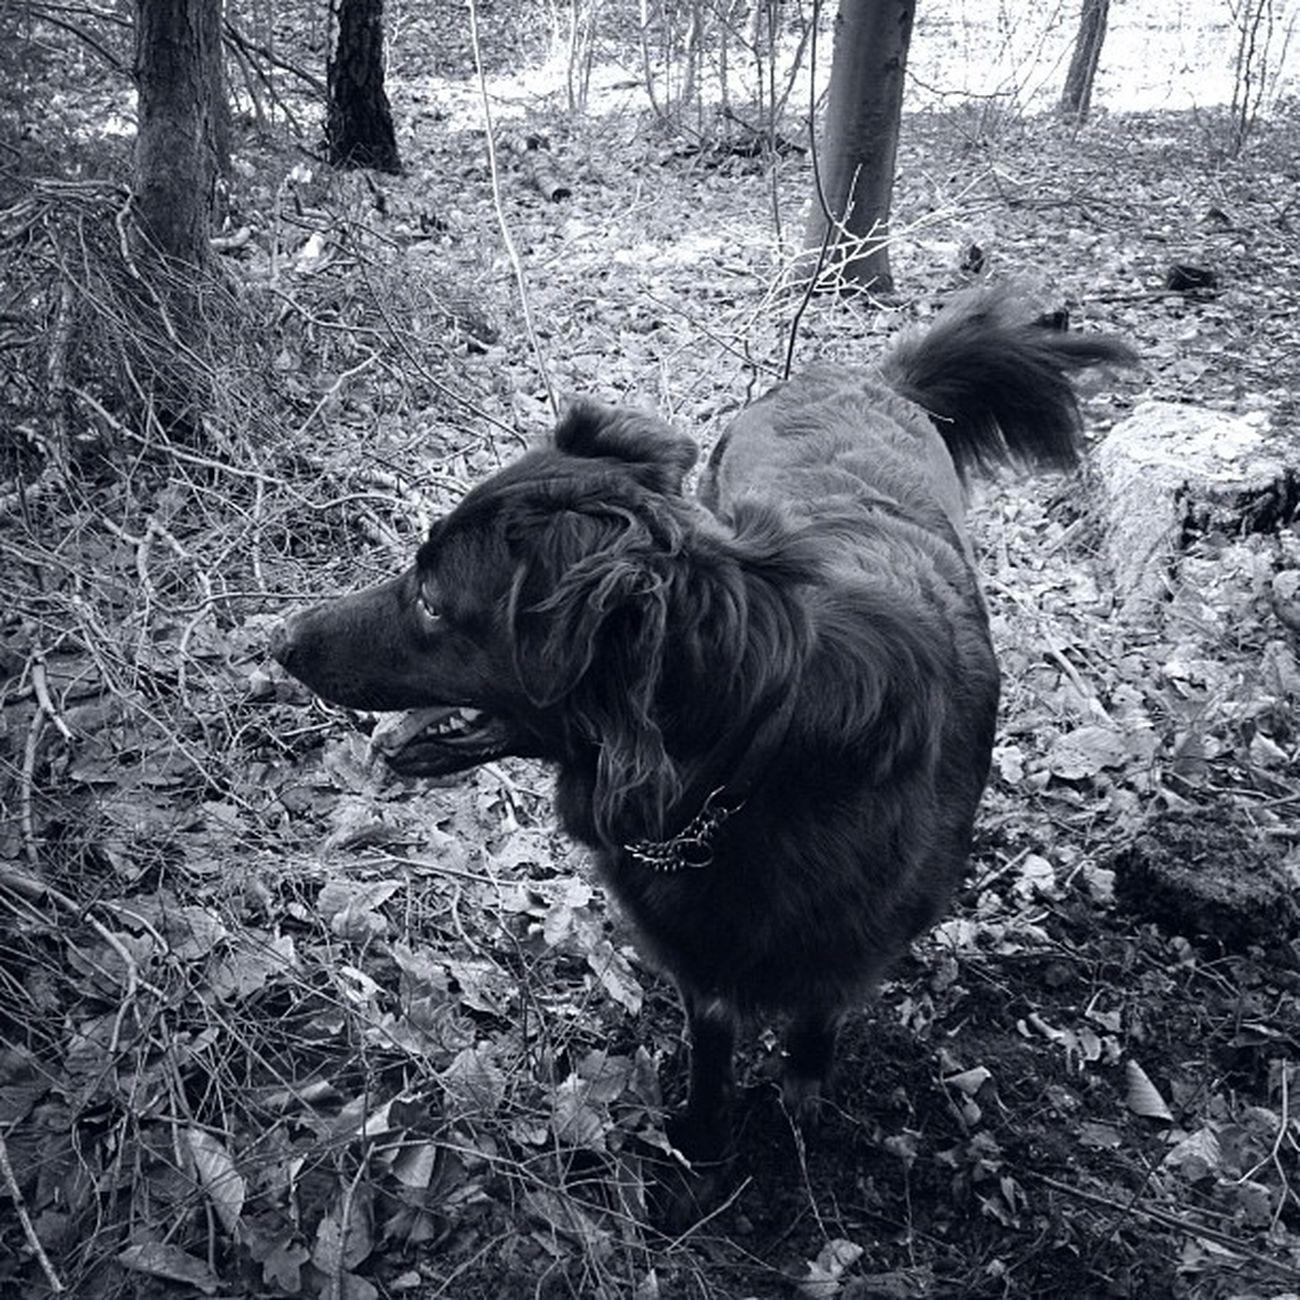 Vildbatting Buster Dog Forrest whatimdoingrightnow